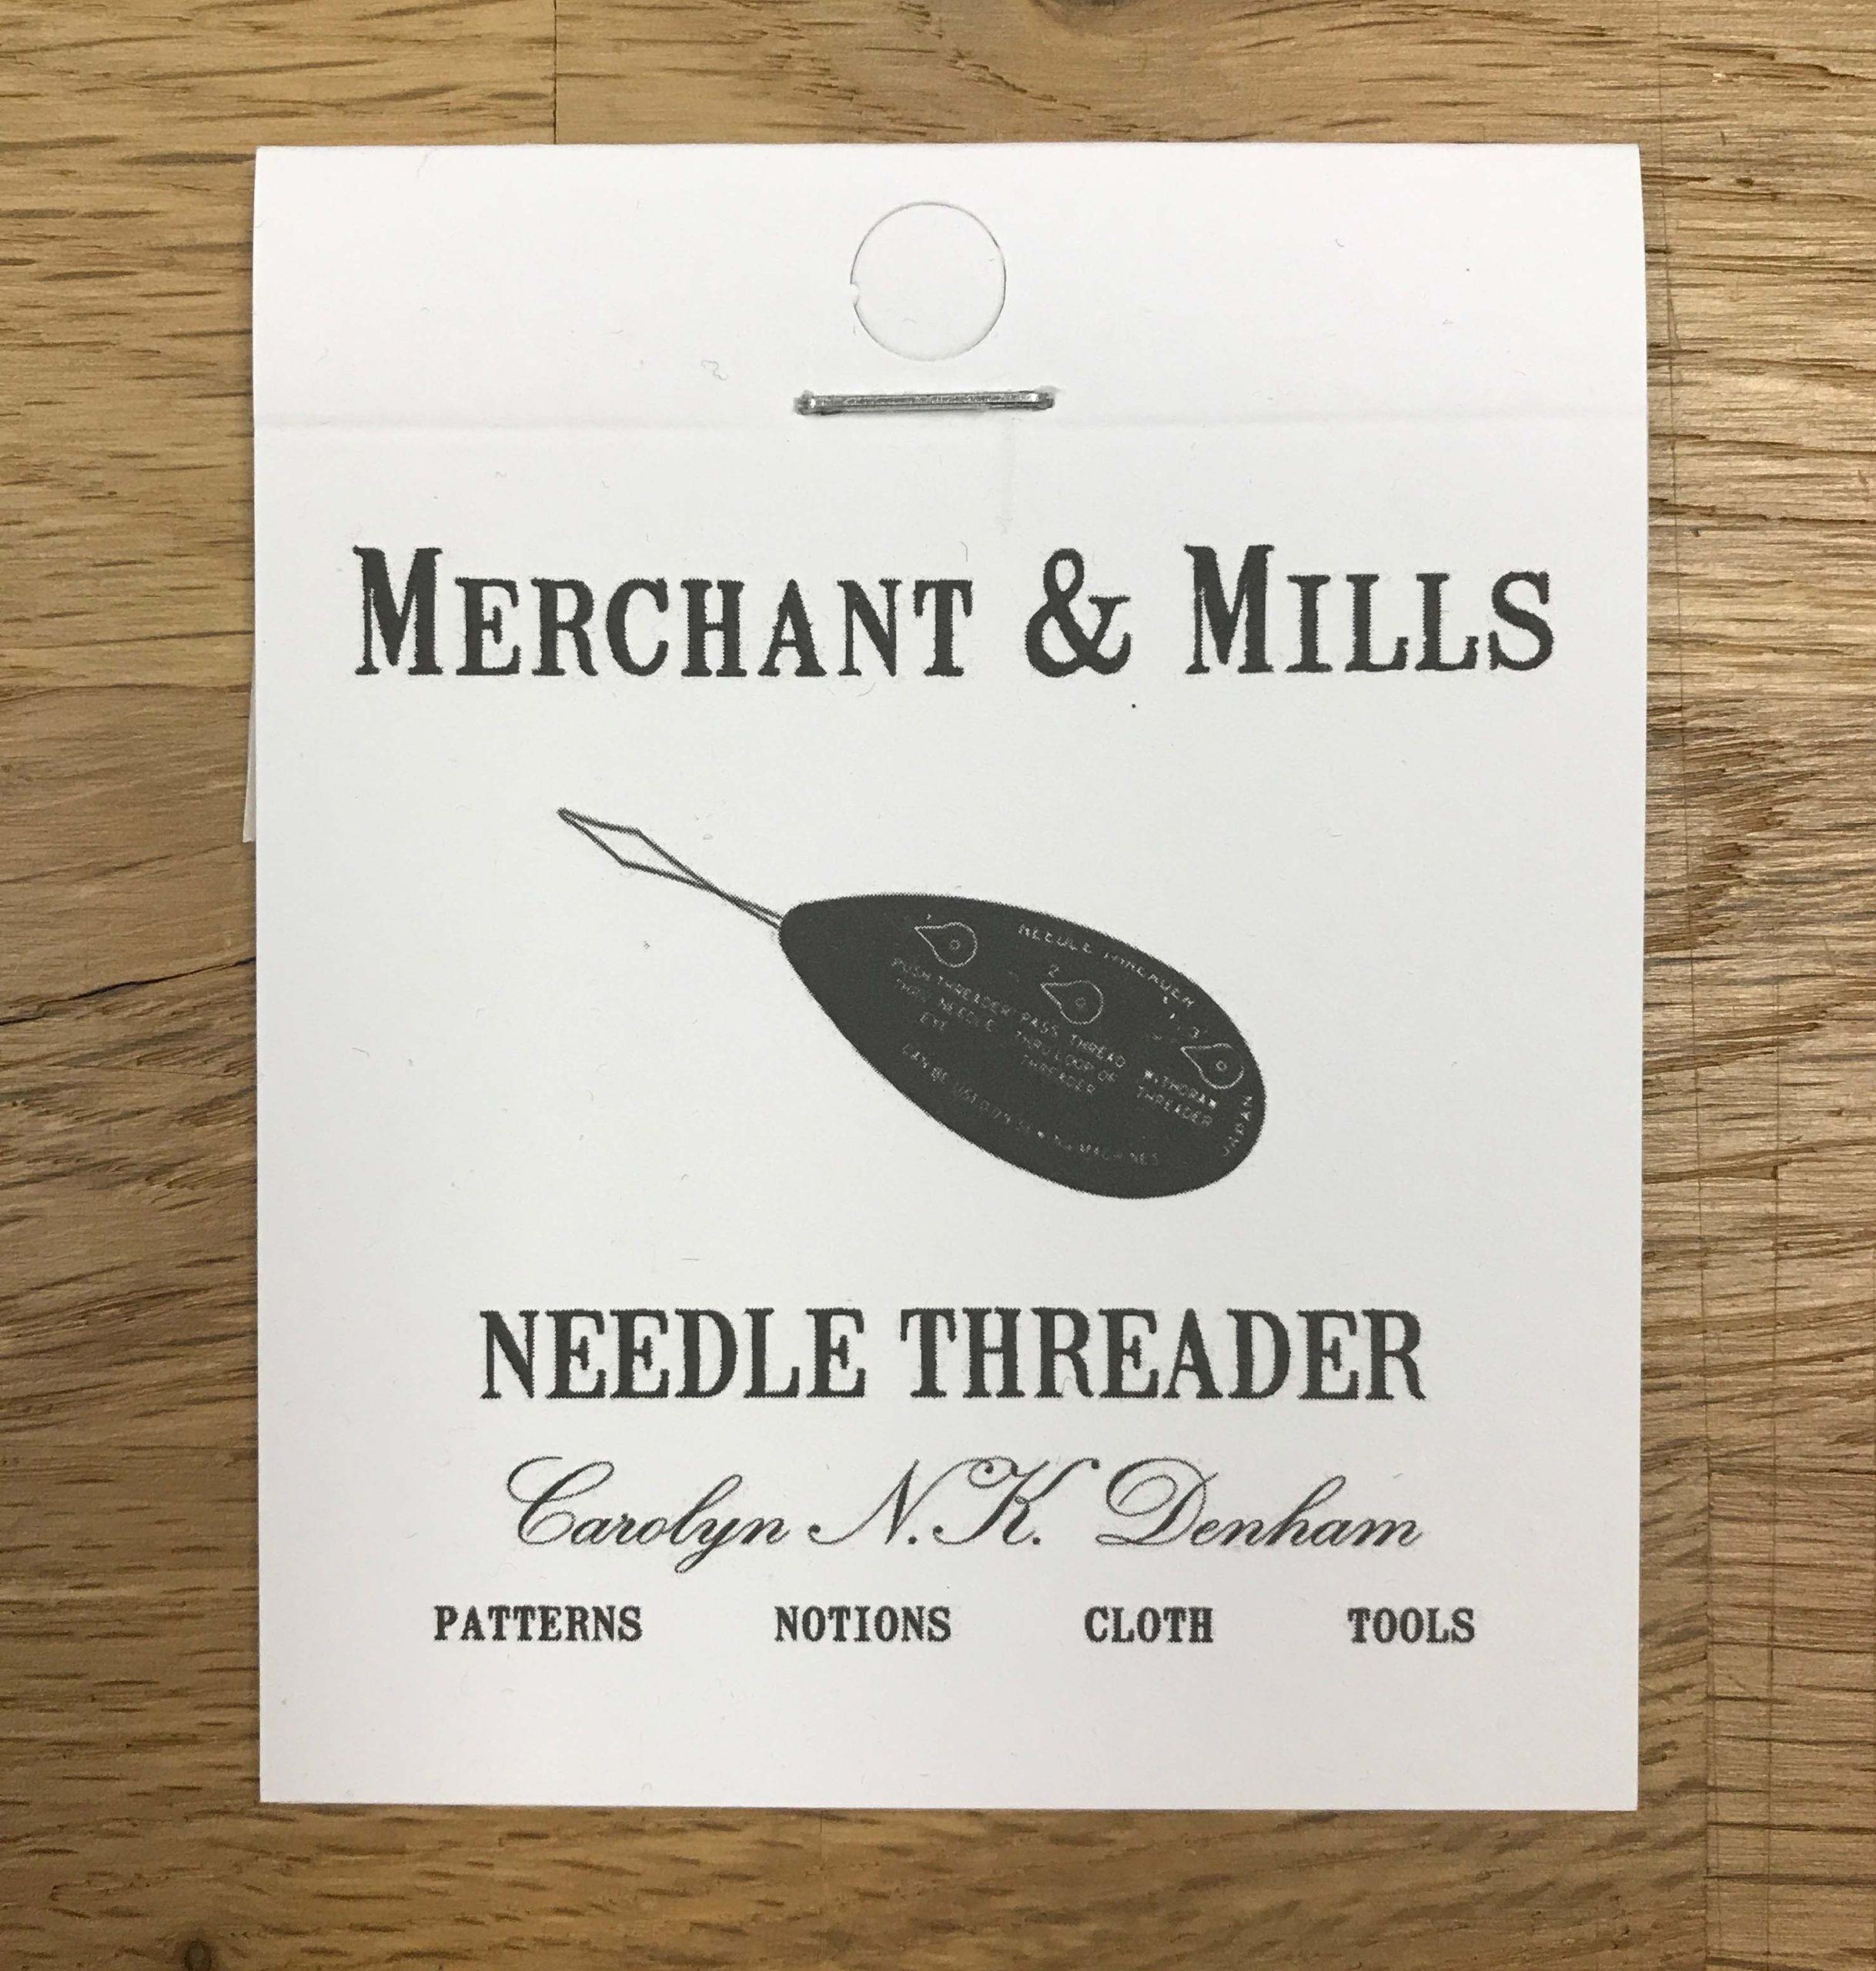 Needle Threader by Merchant & Mills